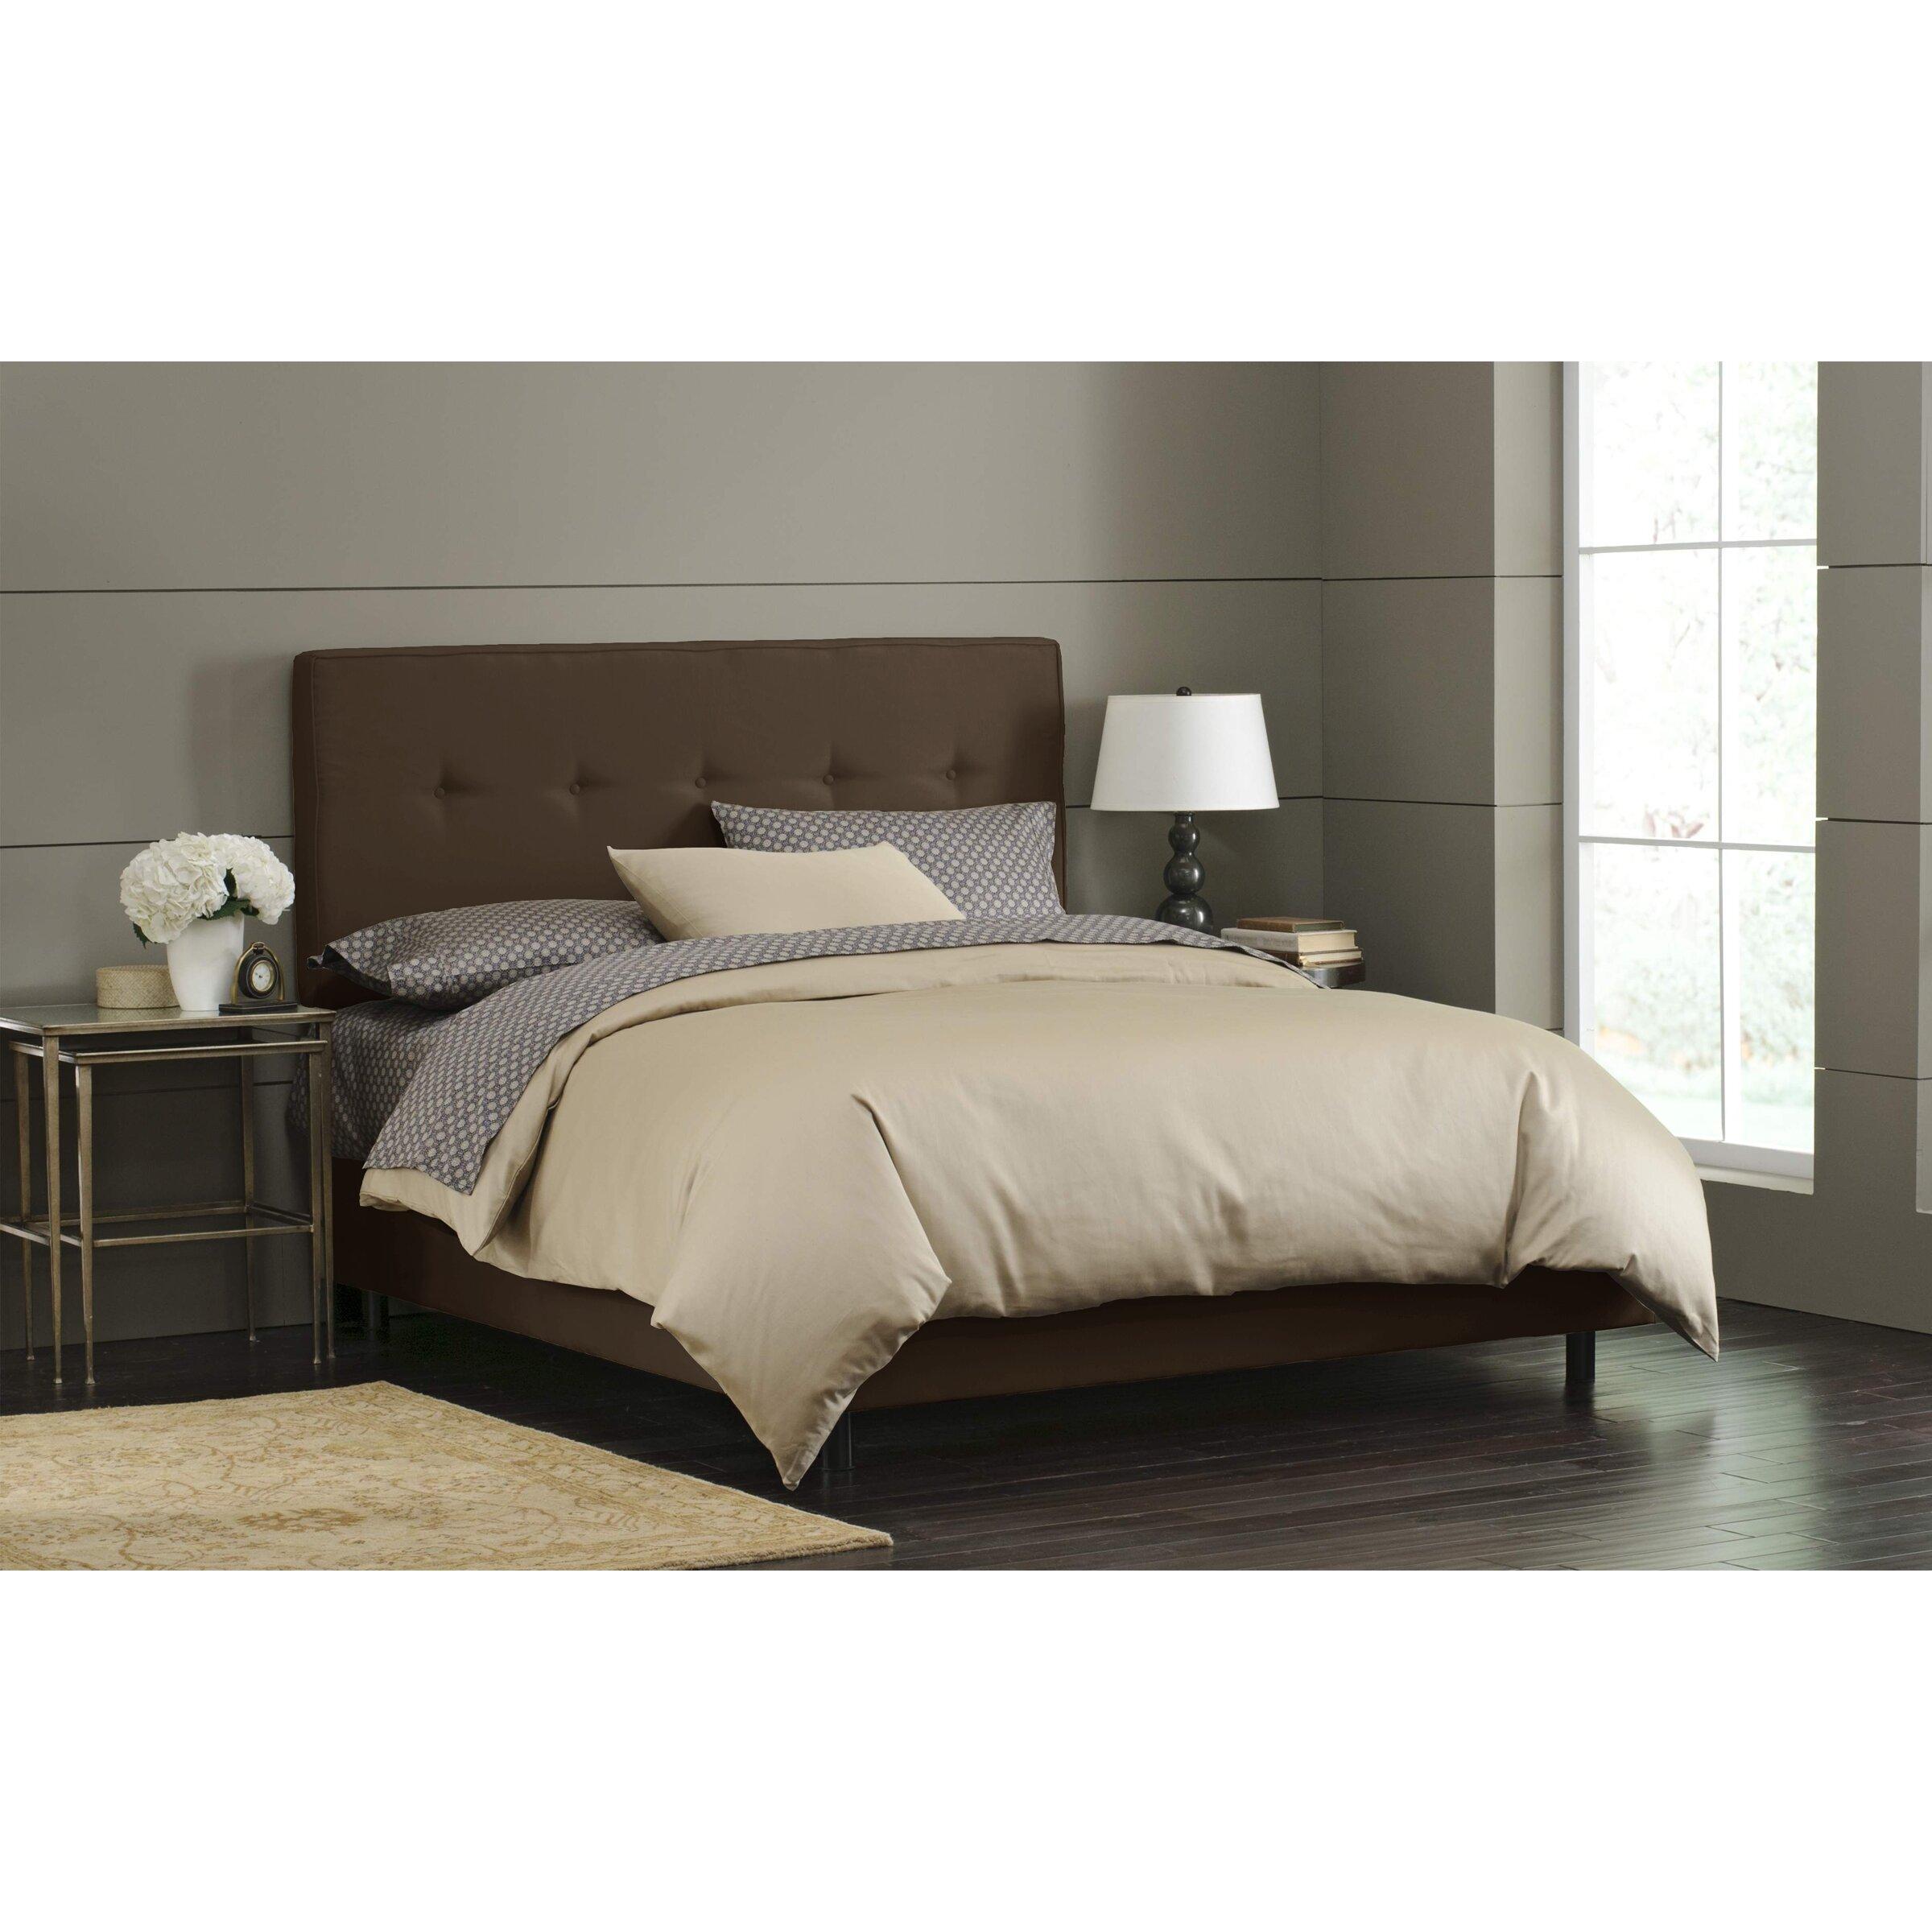 Tufted Bedroom: Skyline Furniture Button Tufted Upholstered Panel Bed